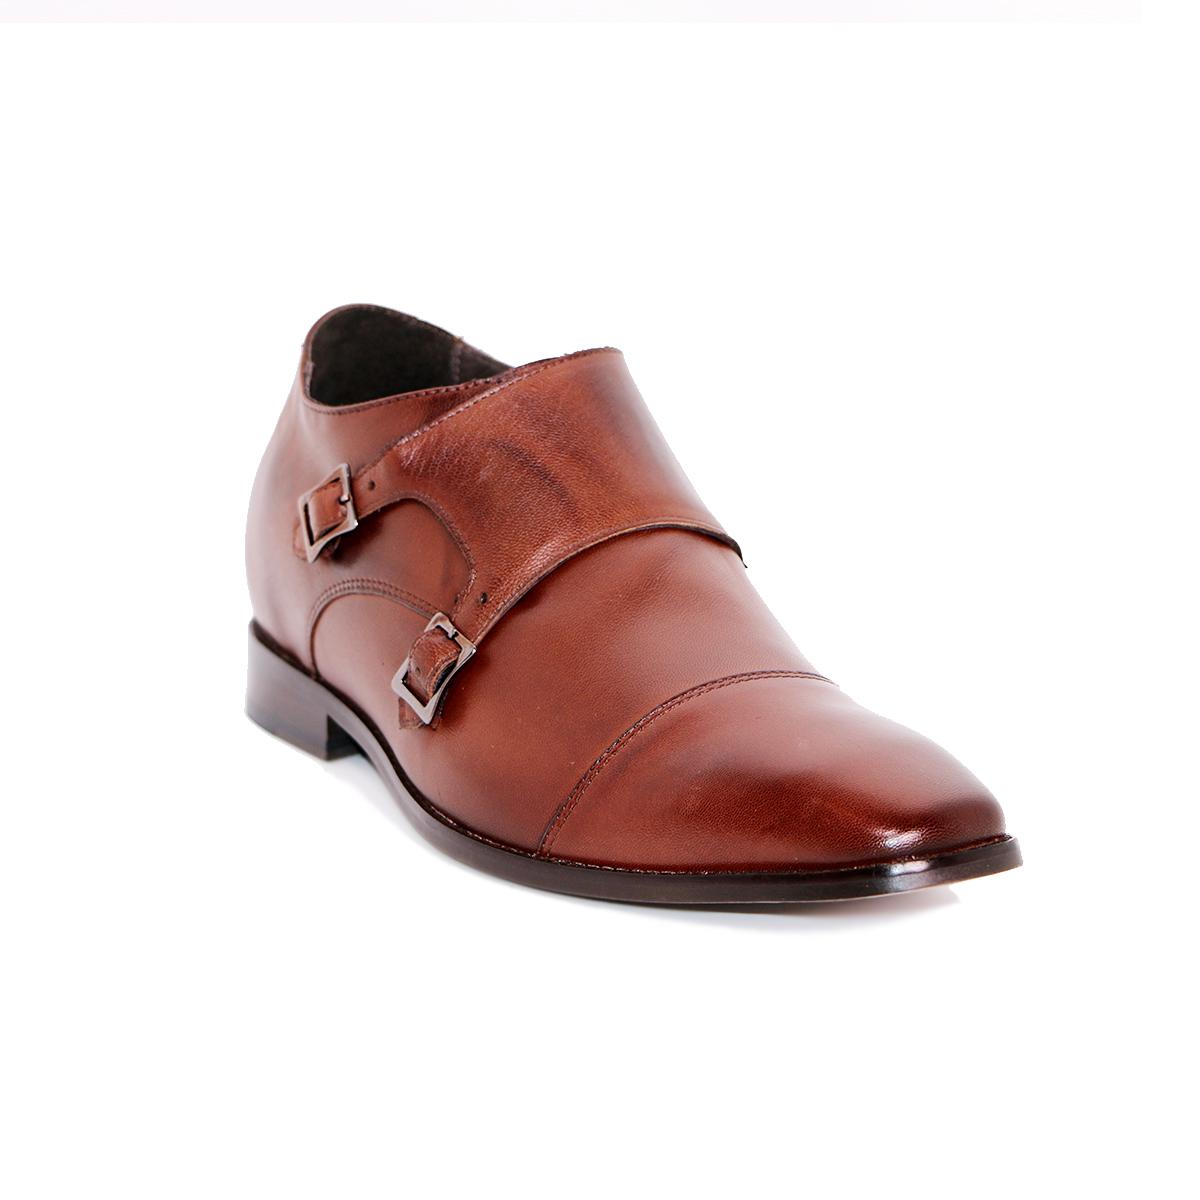 Zapato Formal Lawyers Café Oscuro Max Denegri +7cm de Altura_72734